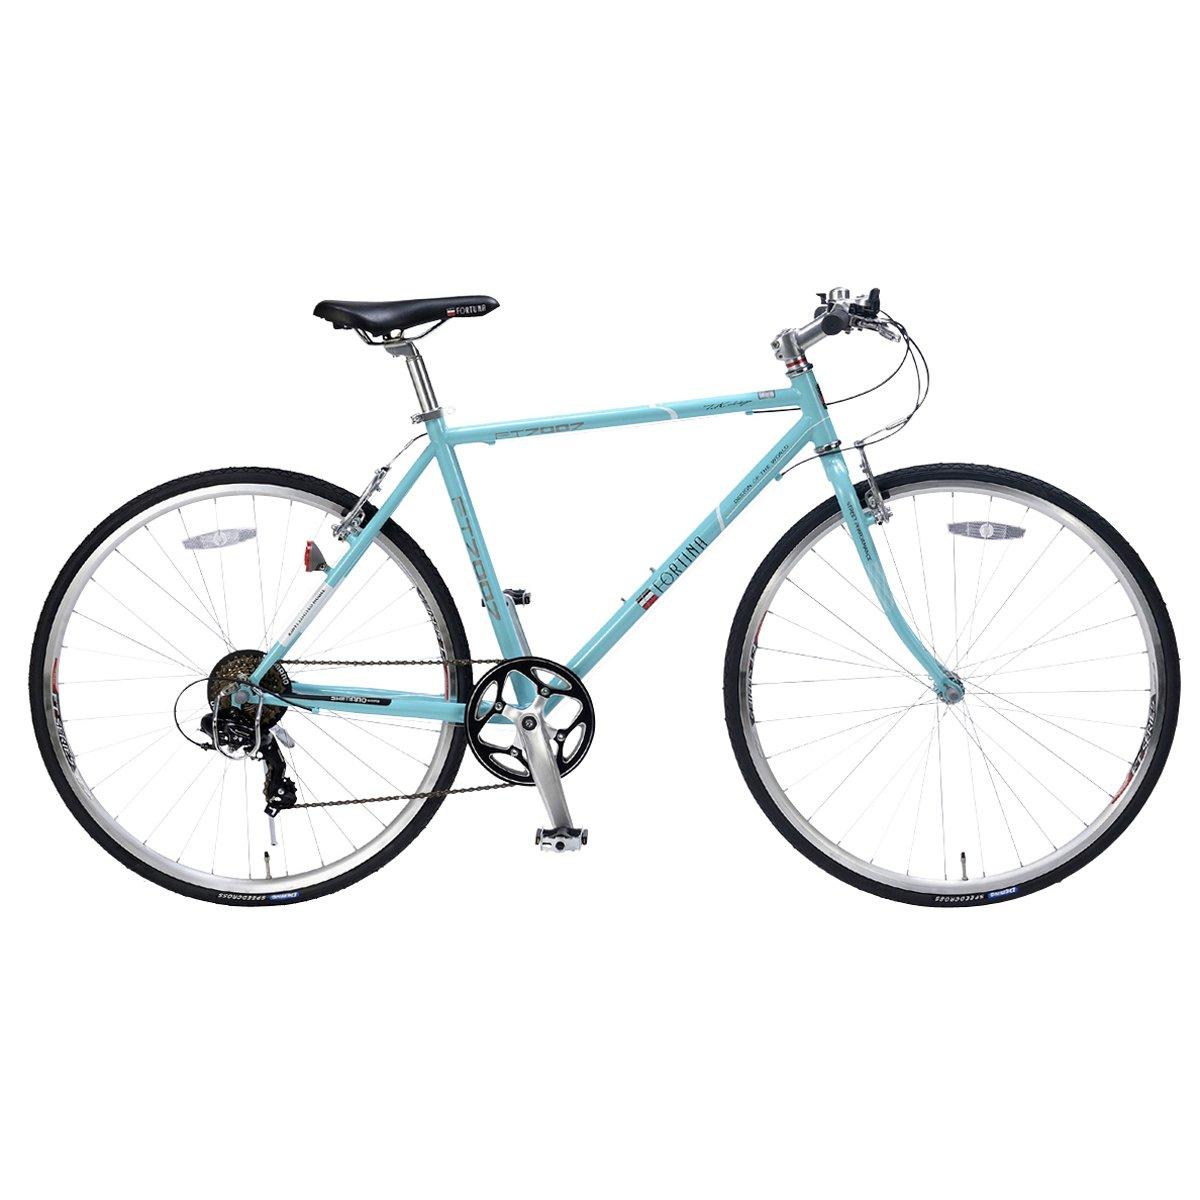 FORTINA FT-7007 700C クロスバイク SHIMANO 7段変速